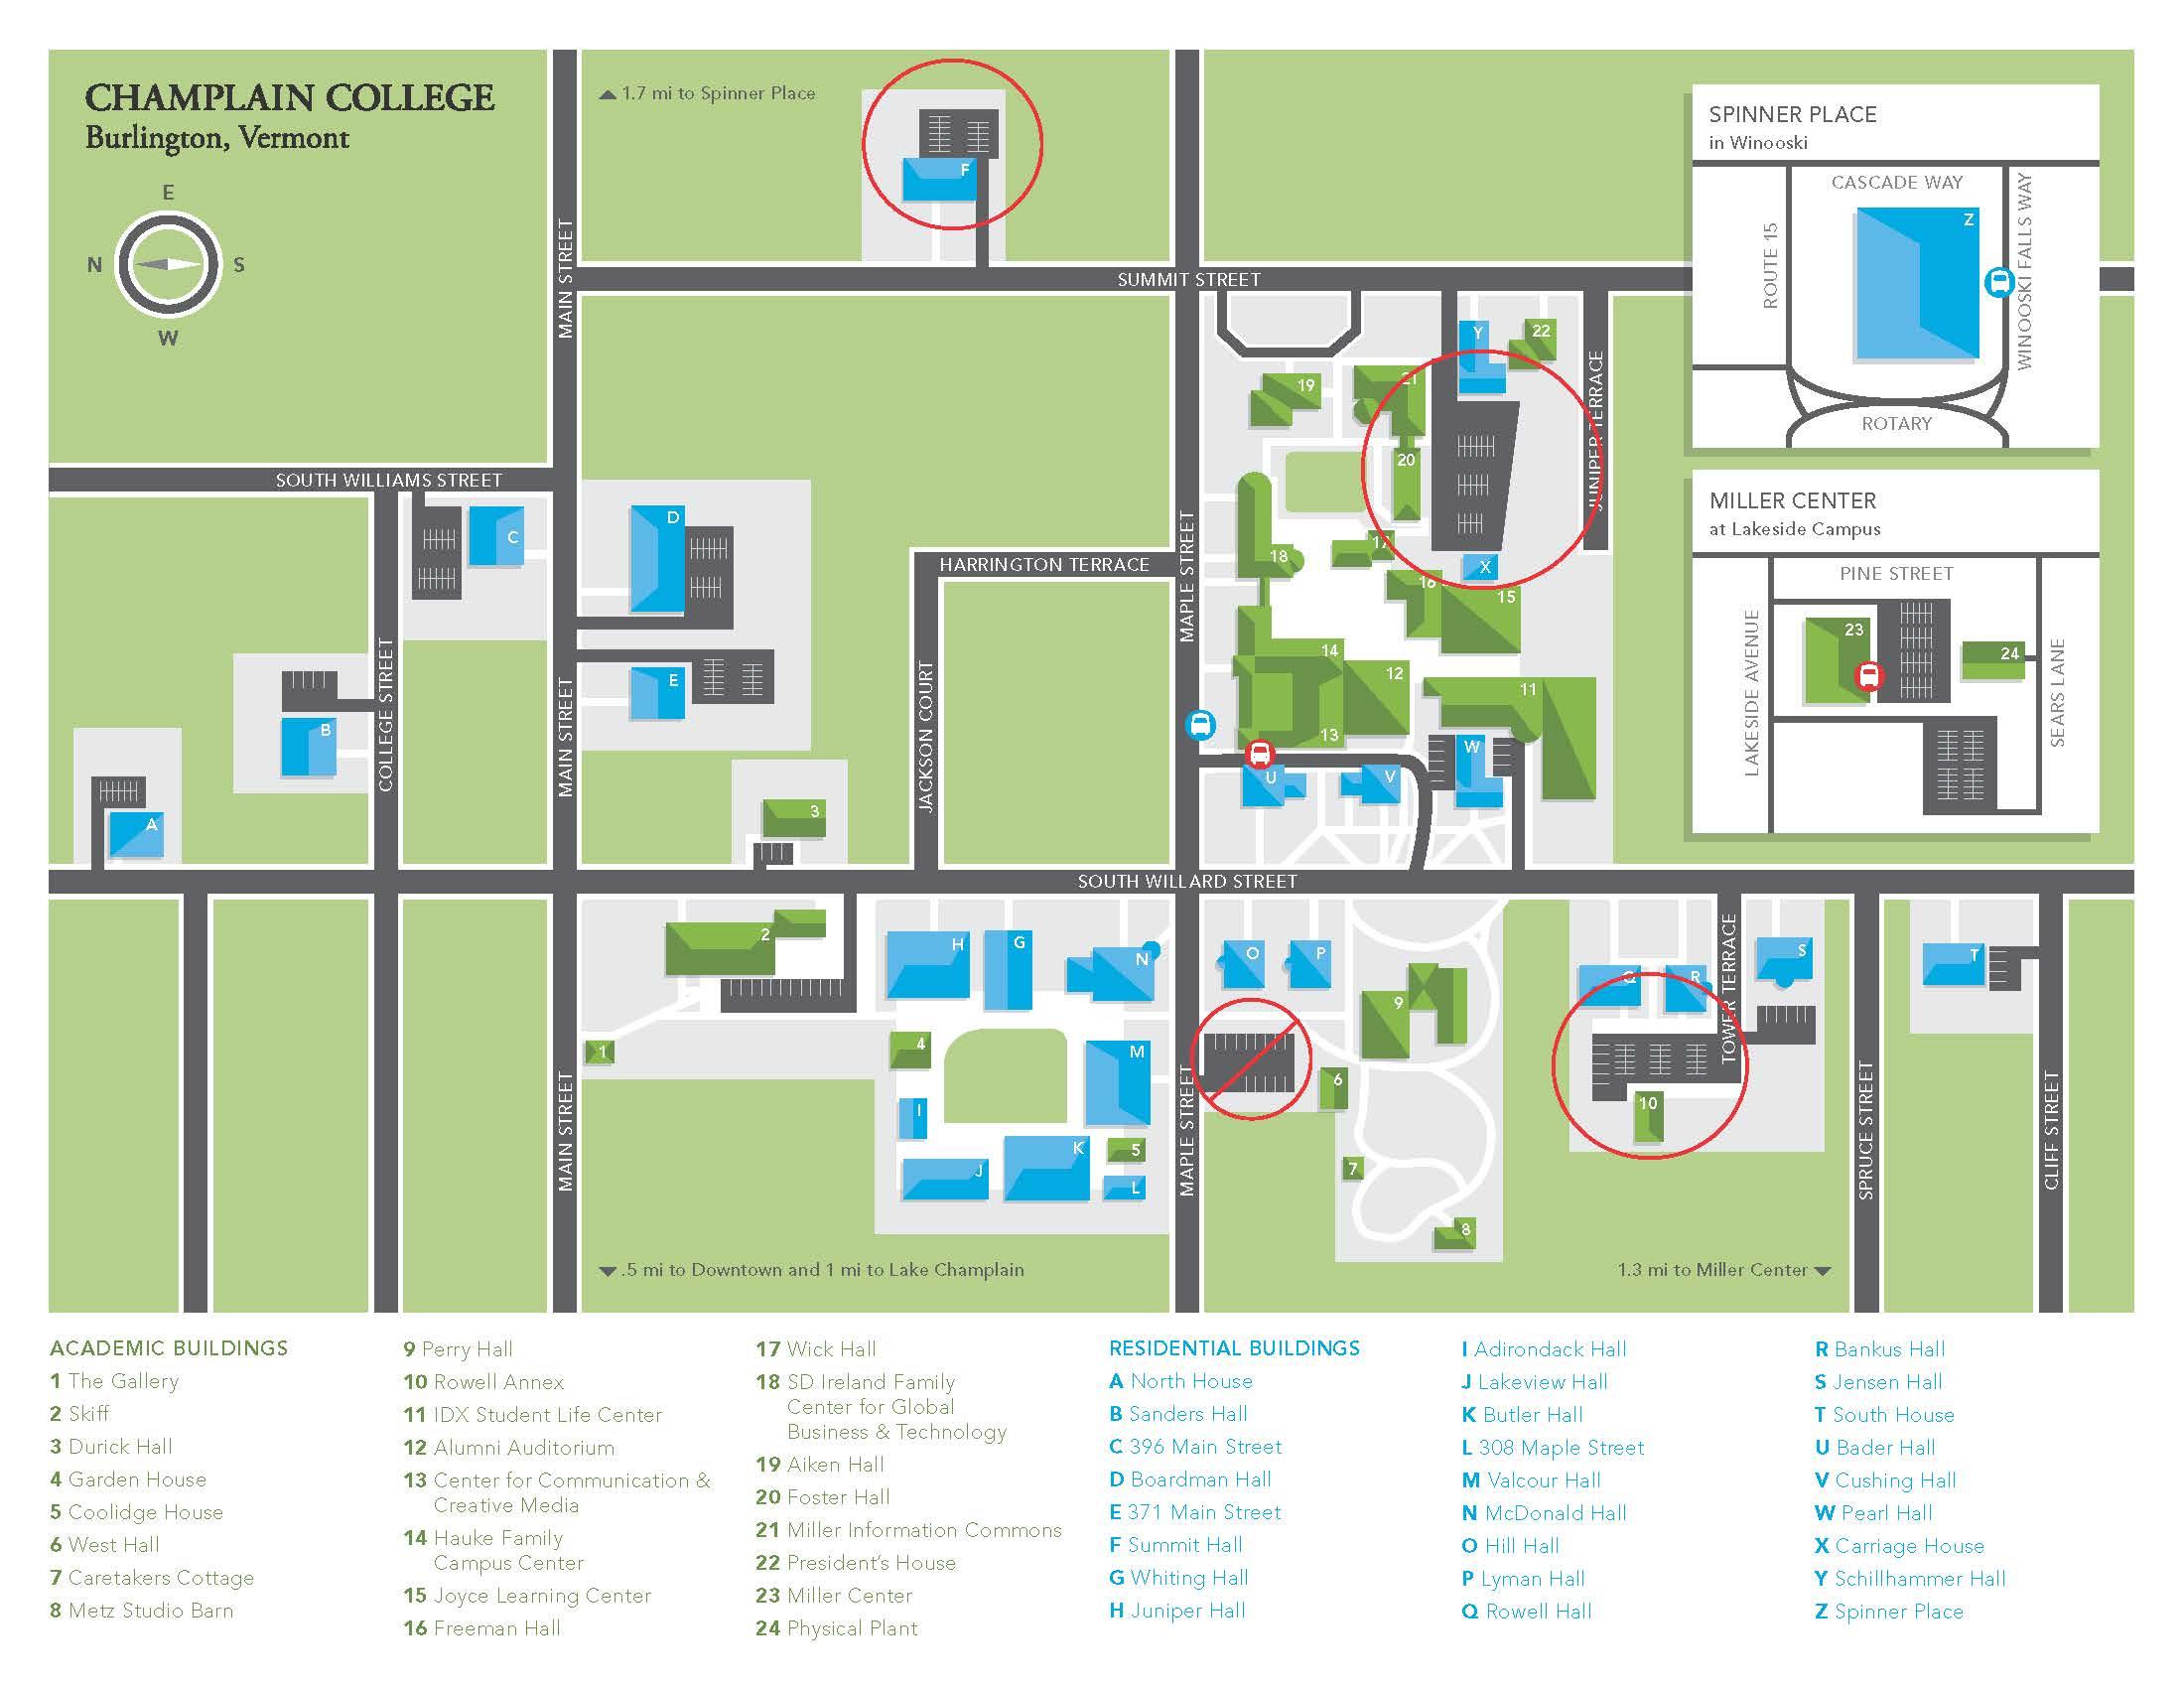 Champlain College Campus Map Ccm – AGCReWall